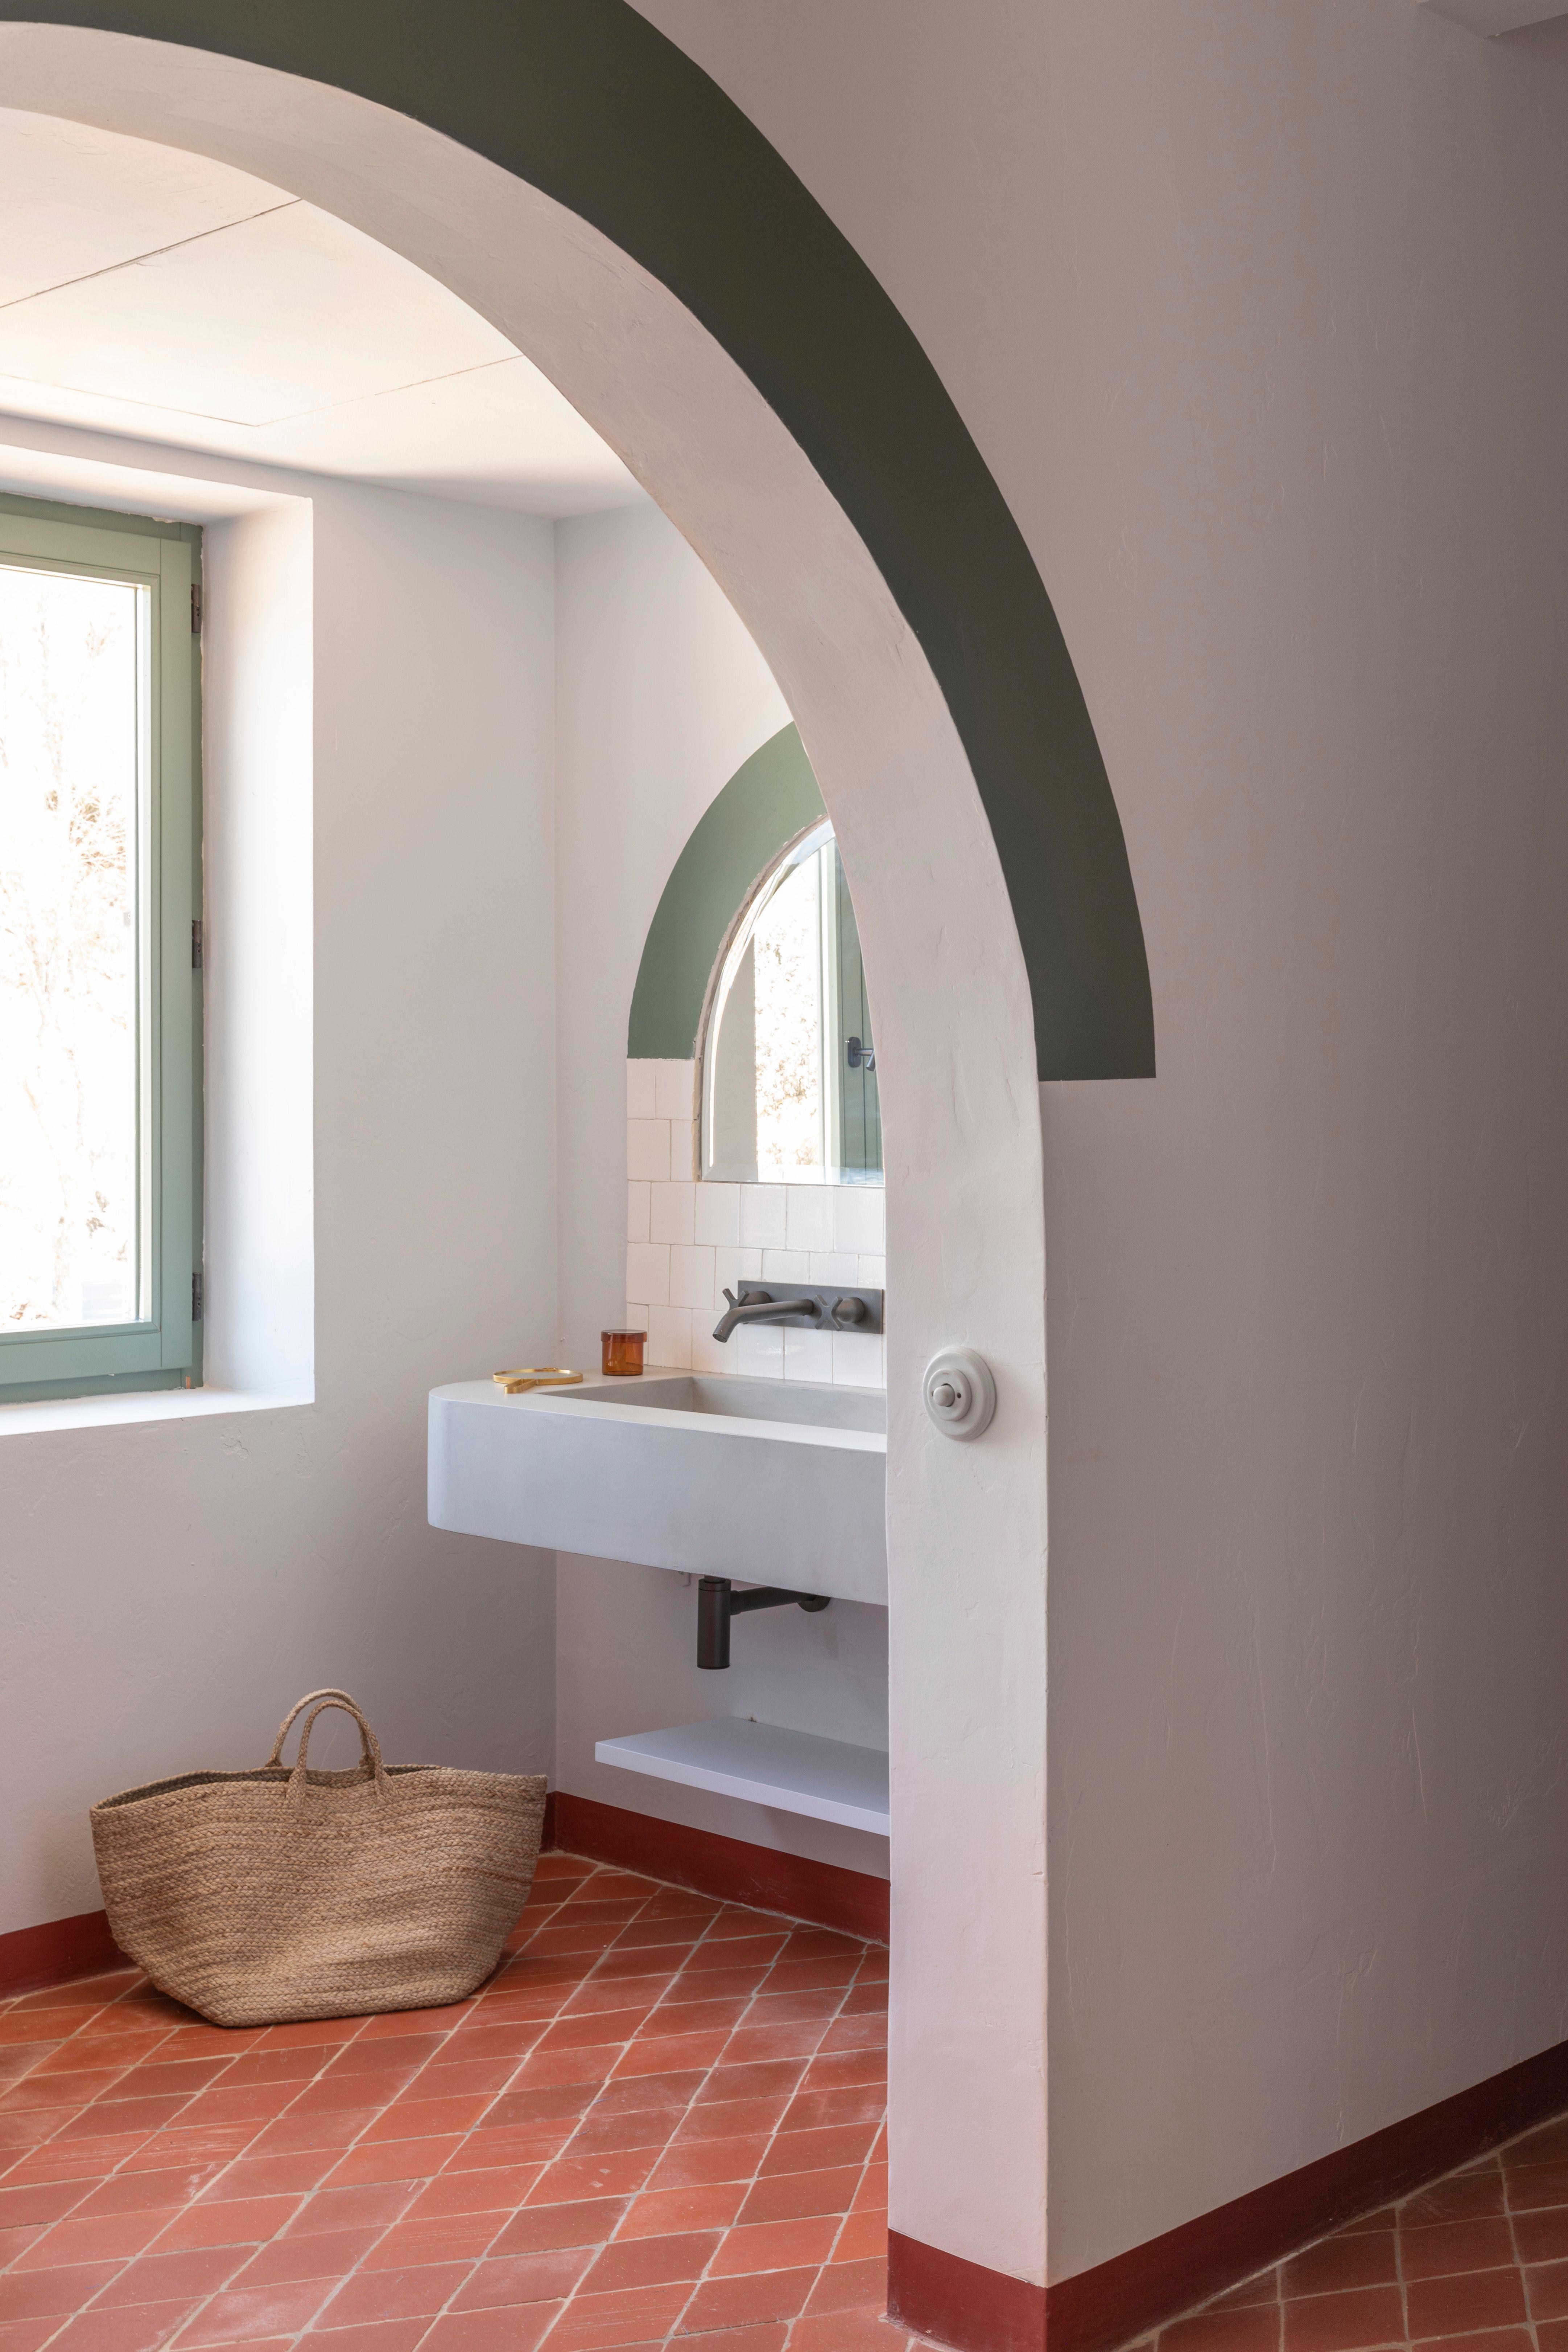 Habitación Son Bou 3 hotel experimental de Menorca